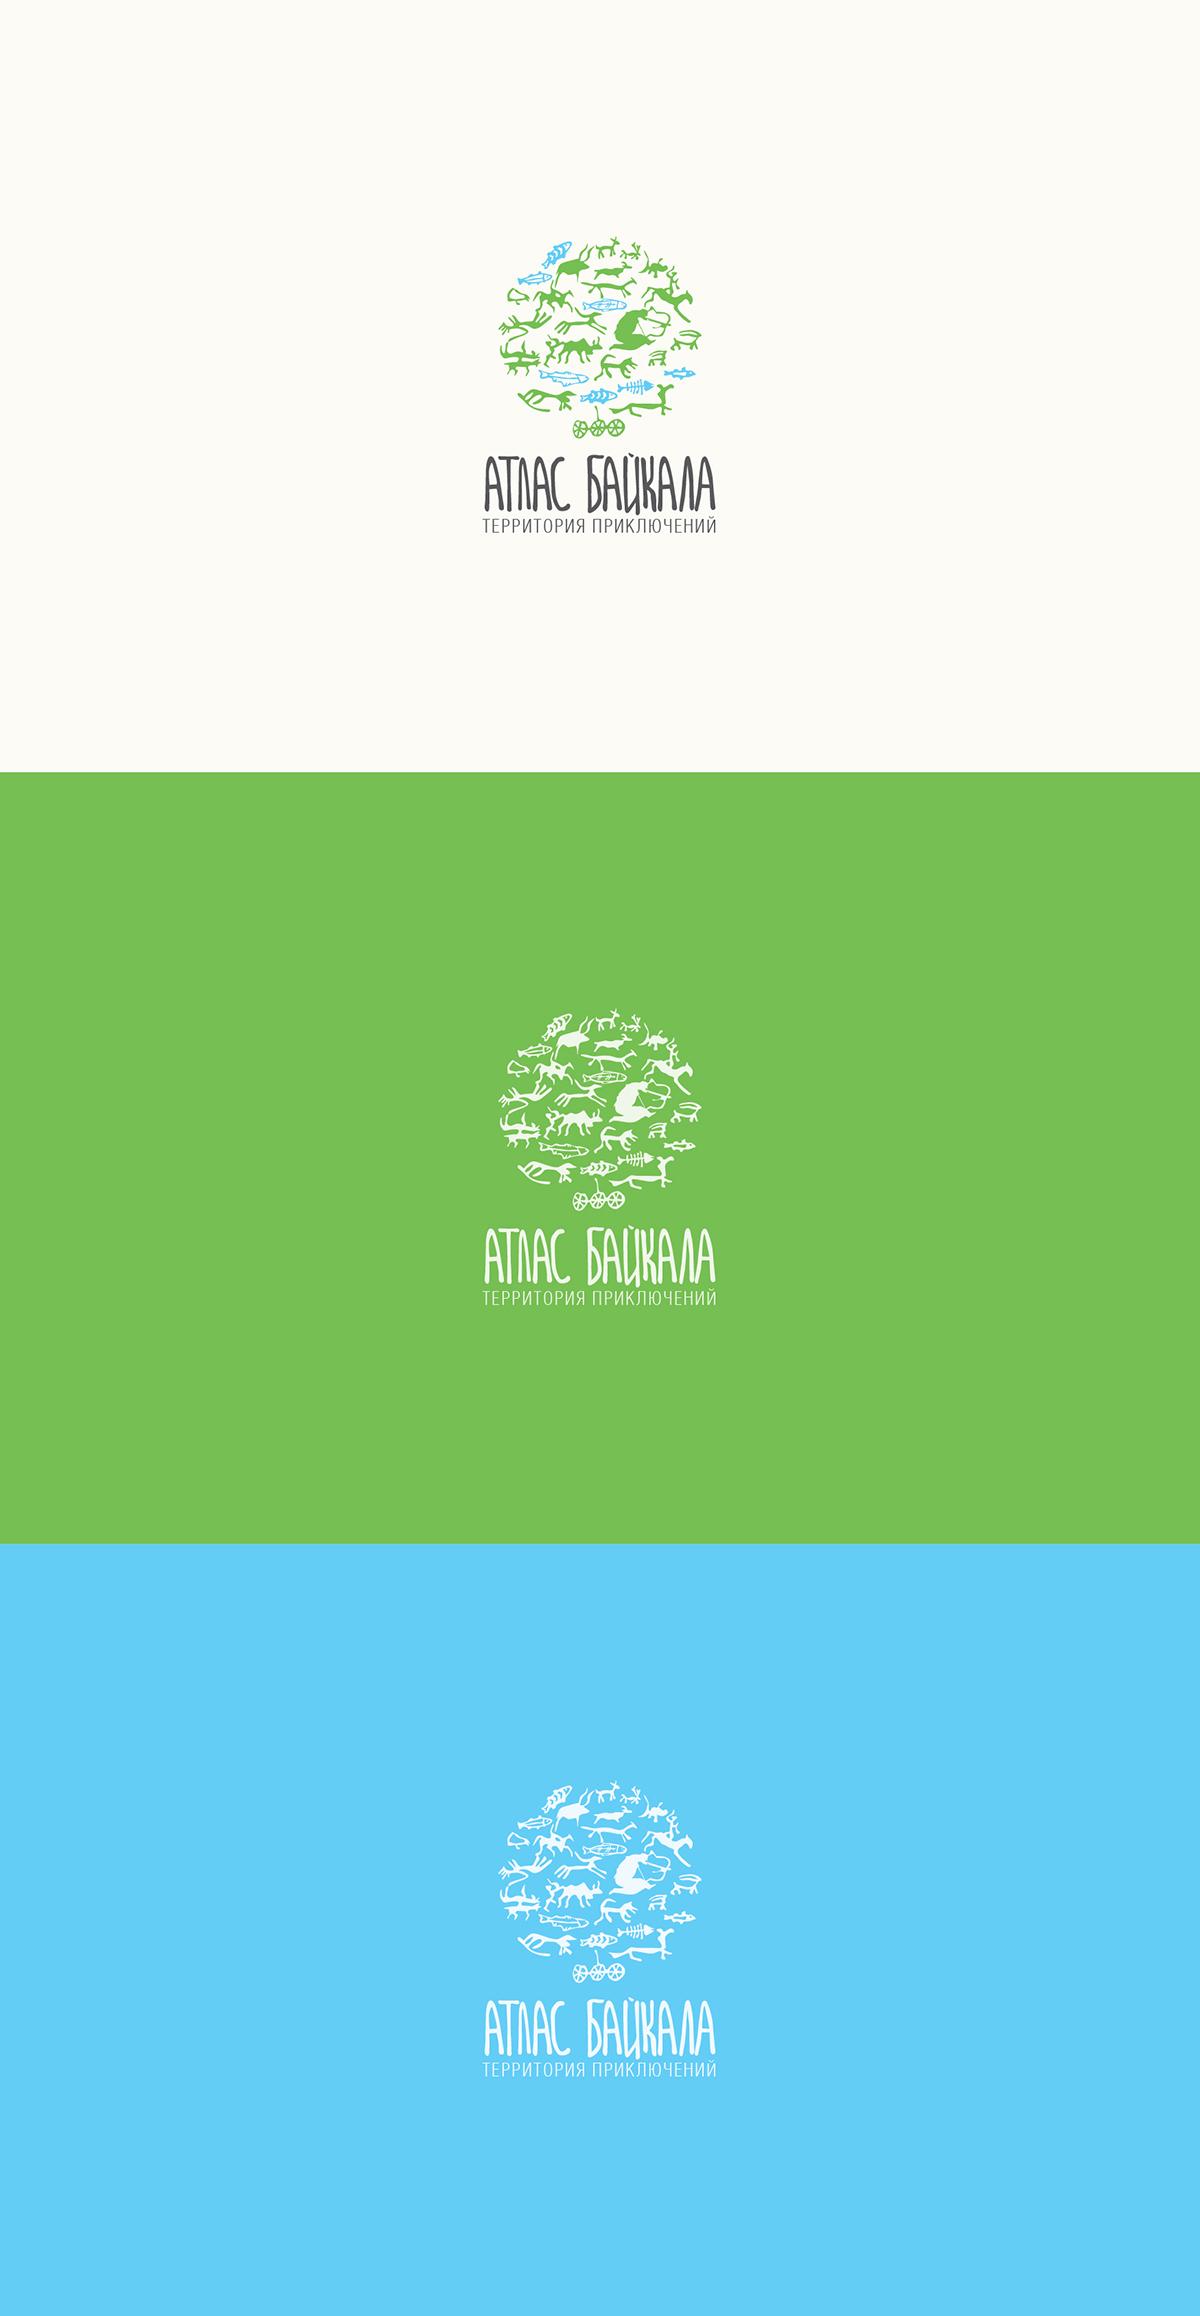 Разработка логотипа Атлас Байкала фото f_0285b06e7914628c.jpg